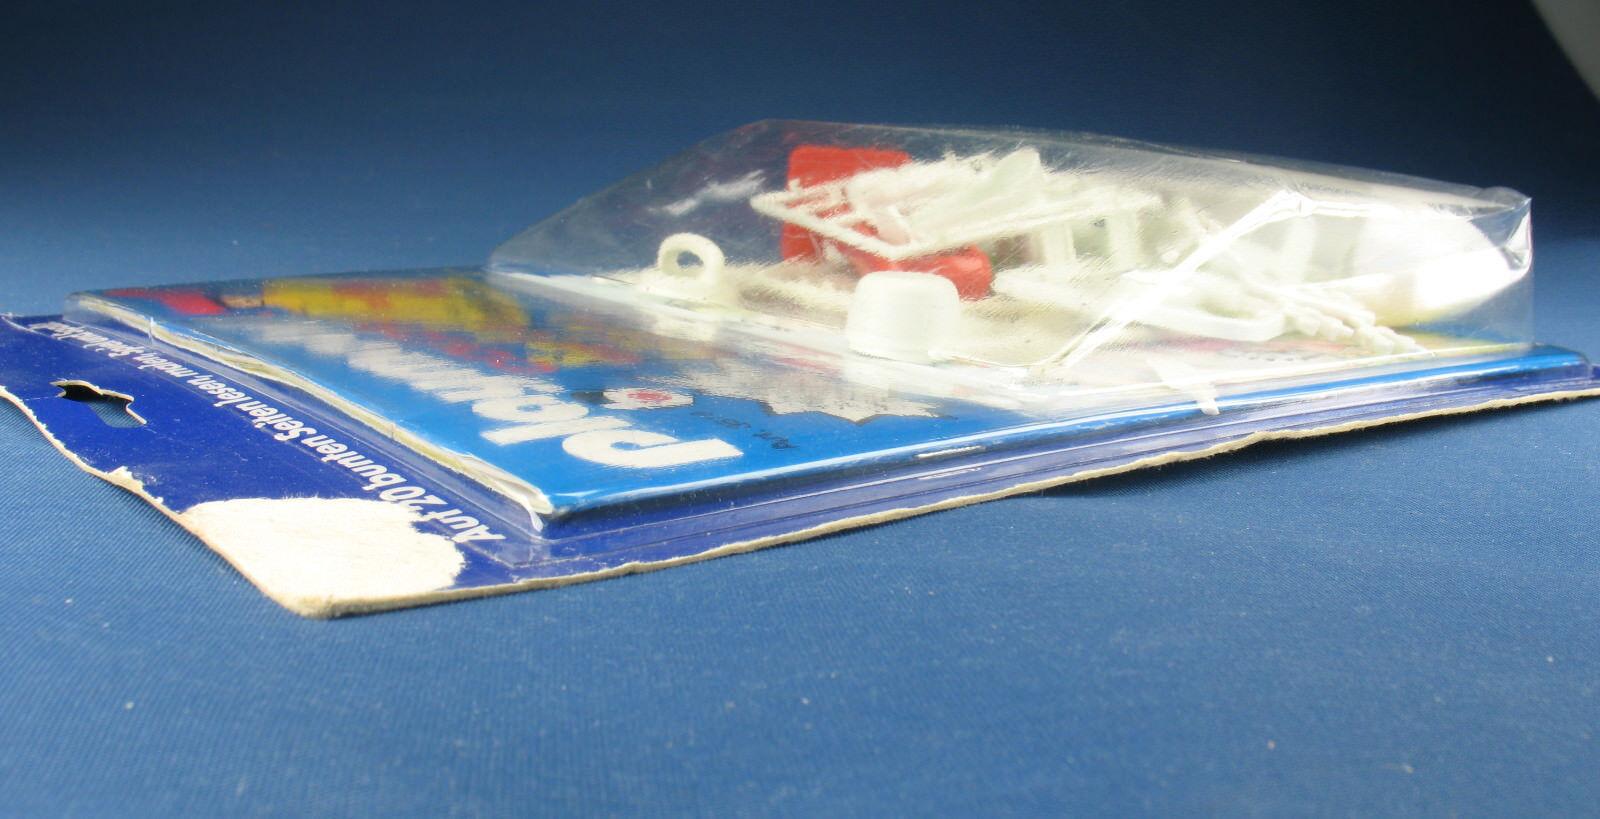 PLAYMOBIL COLOR 3619 3619 3619 - Spielkiste Nr. 2 - Indianer - 1979 - NEU & OVP - New MISB 6fec75